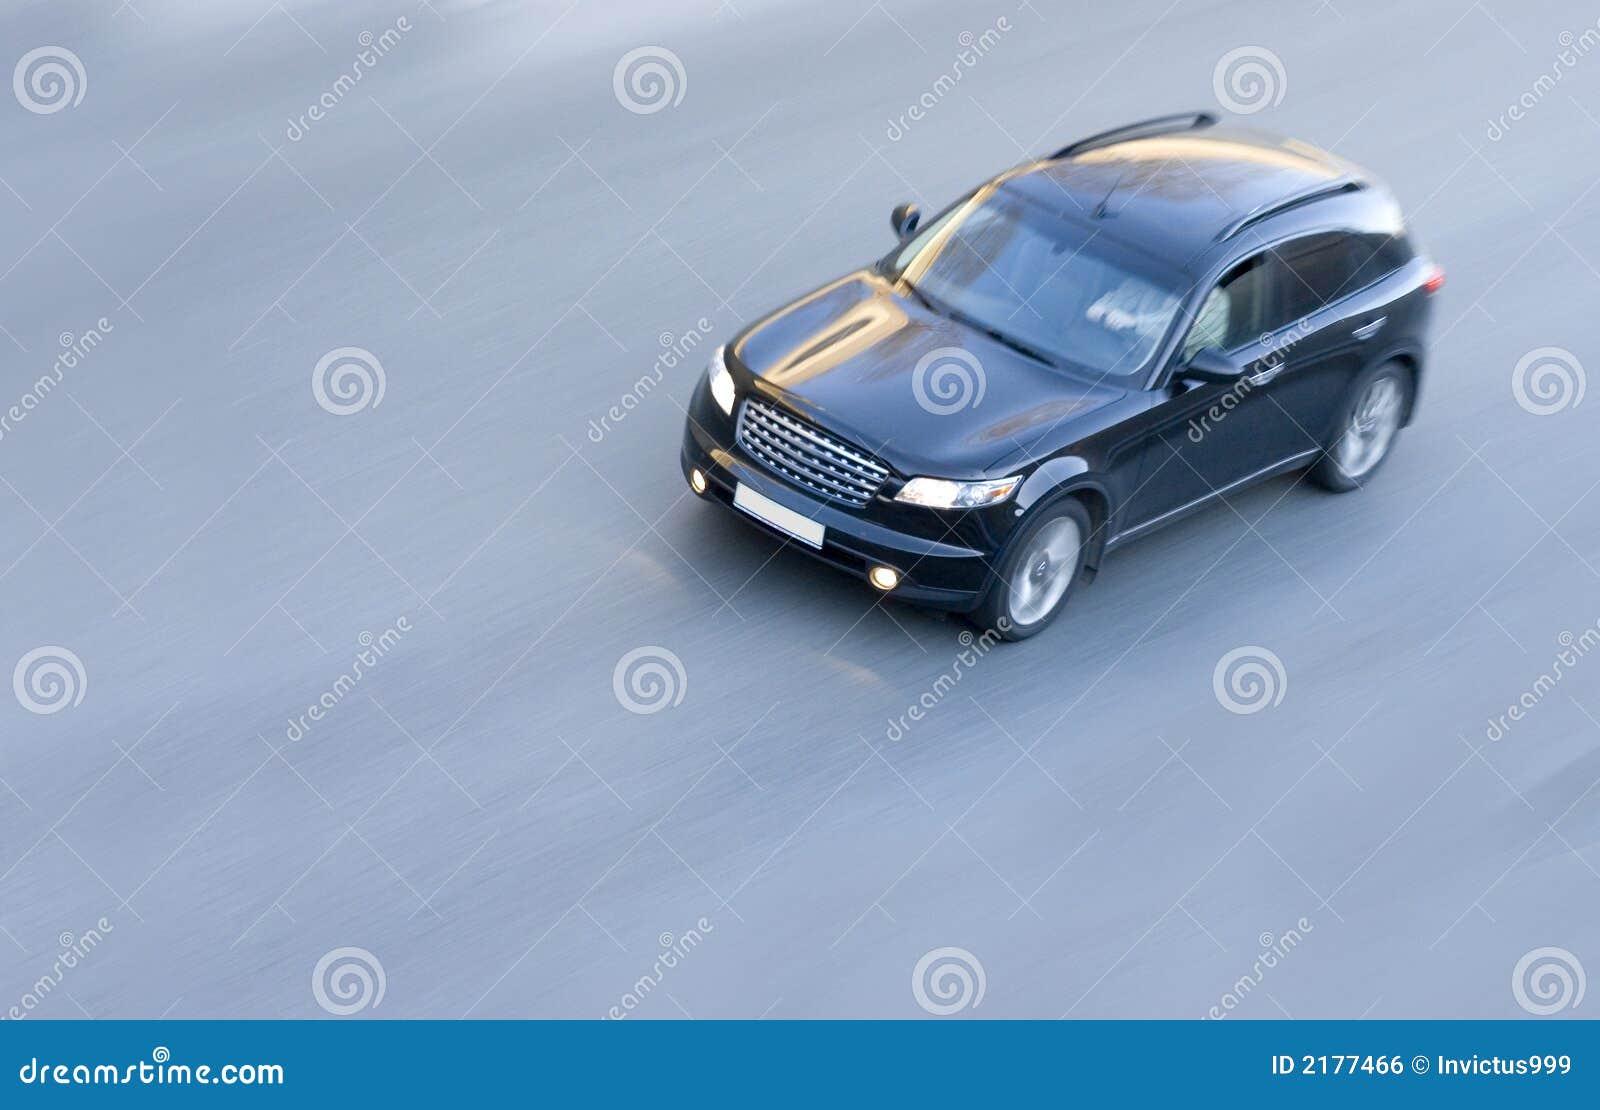 Black Luxury Vehicles: Black Suv Infinity Luxury Car Royalty Free Stock Image